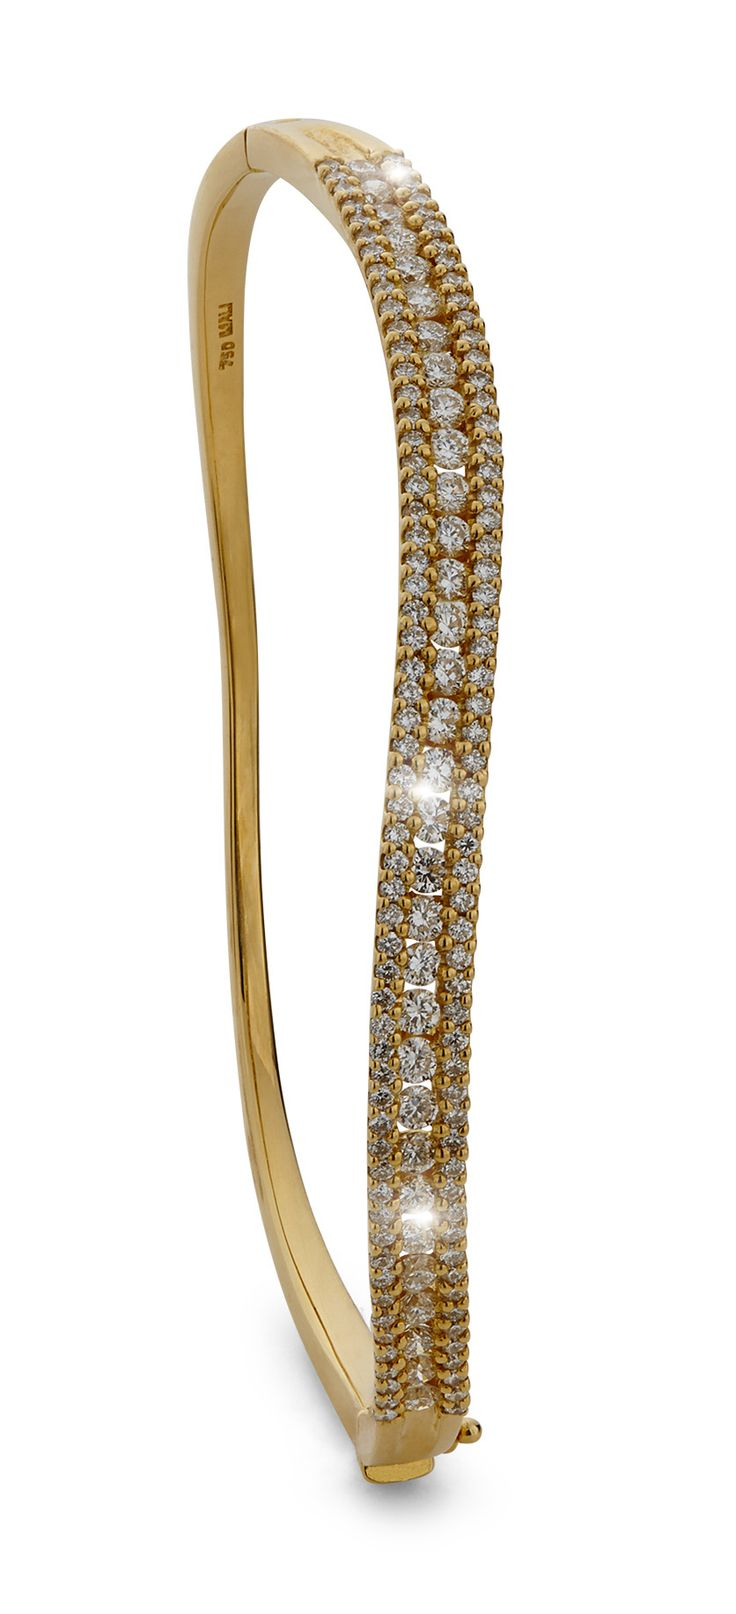 #Bracelet #Diamonds #gold #jewellery #Anniversary #gift #LialiJewellery #Love #celebrate